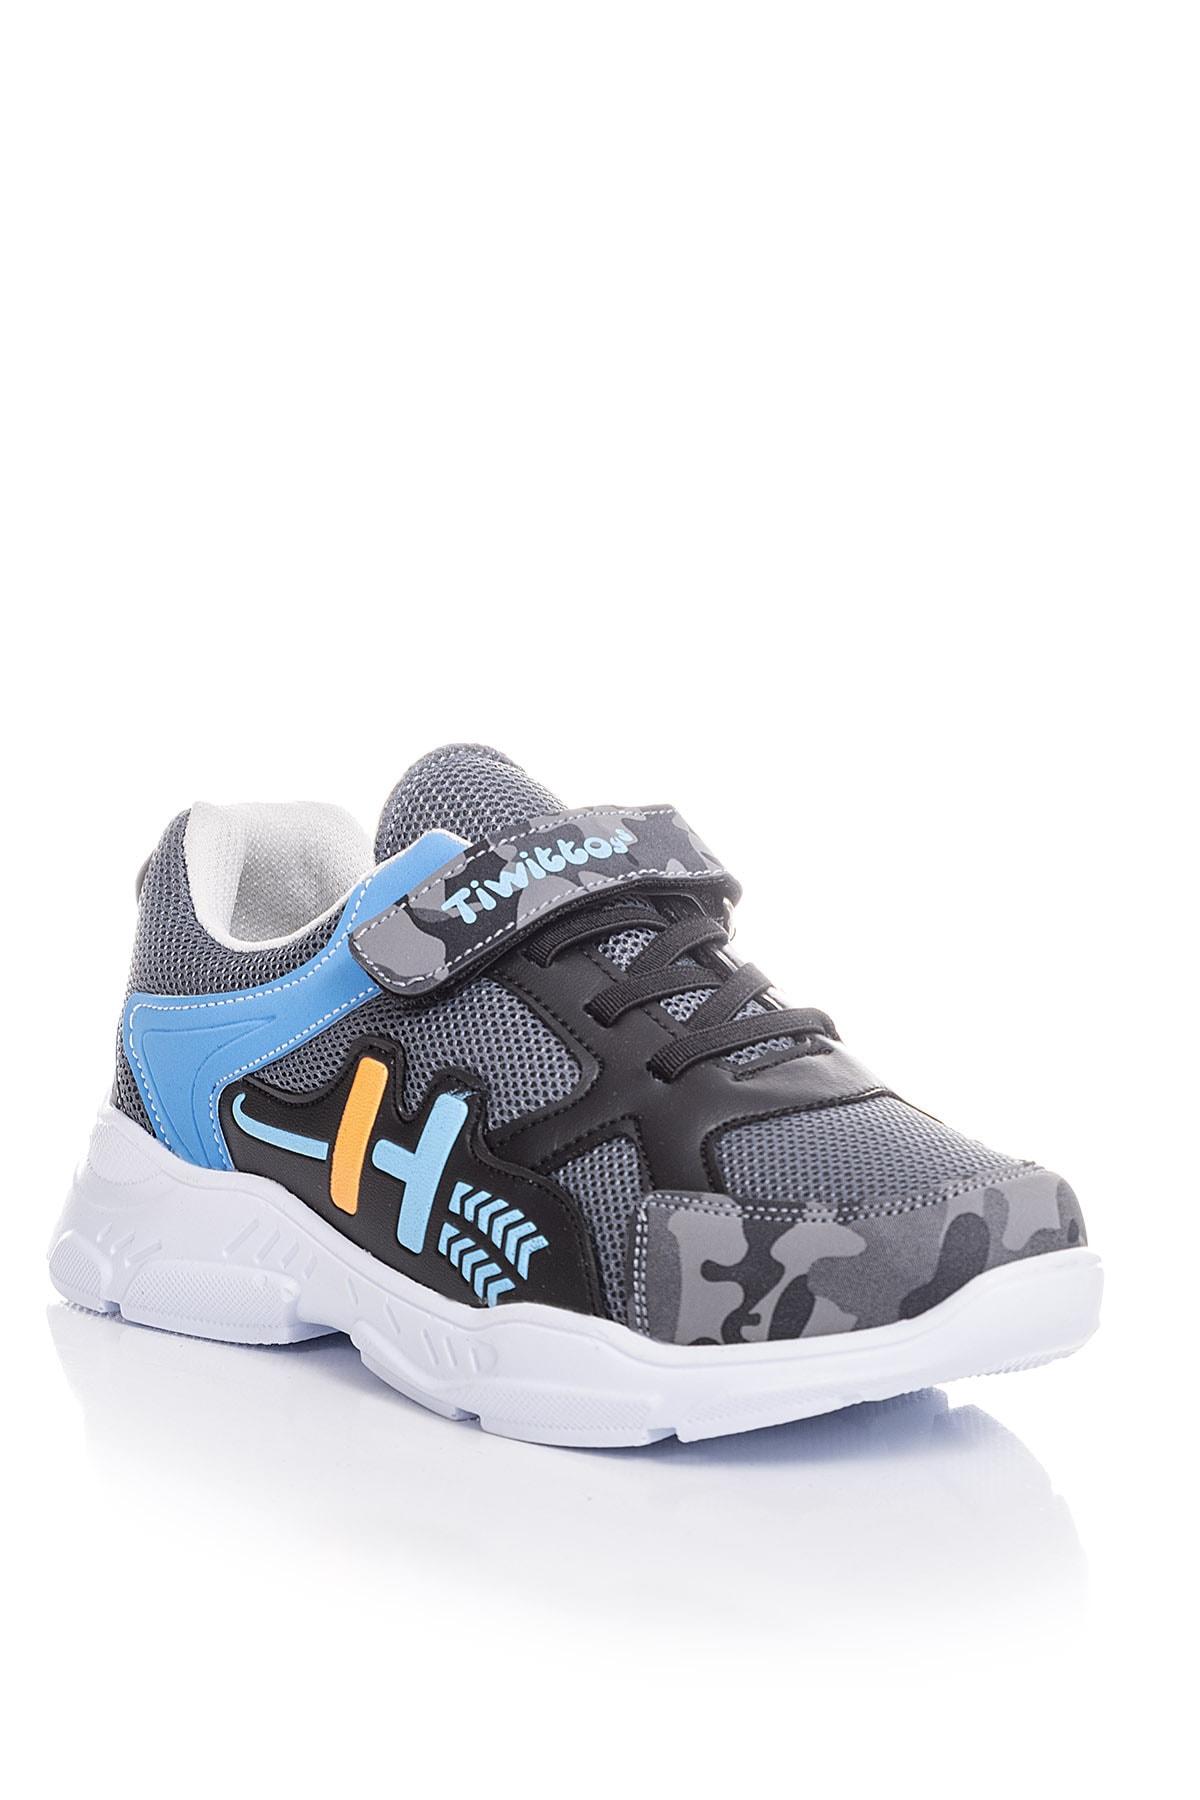 Tonny Black Füme Turkuaz Unisex Çocuk Sneaker TBZ13-3 1